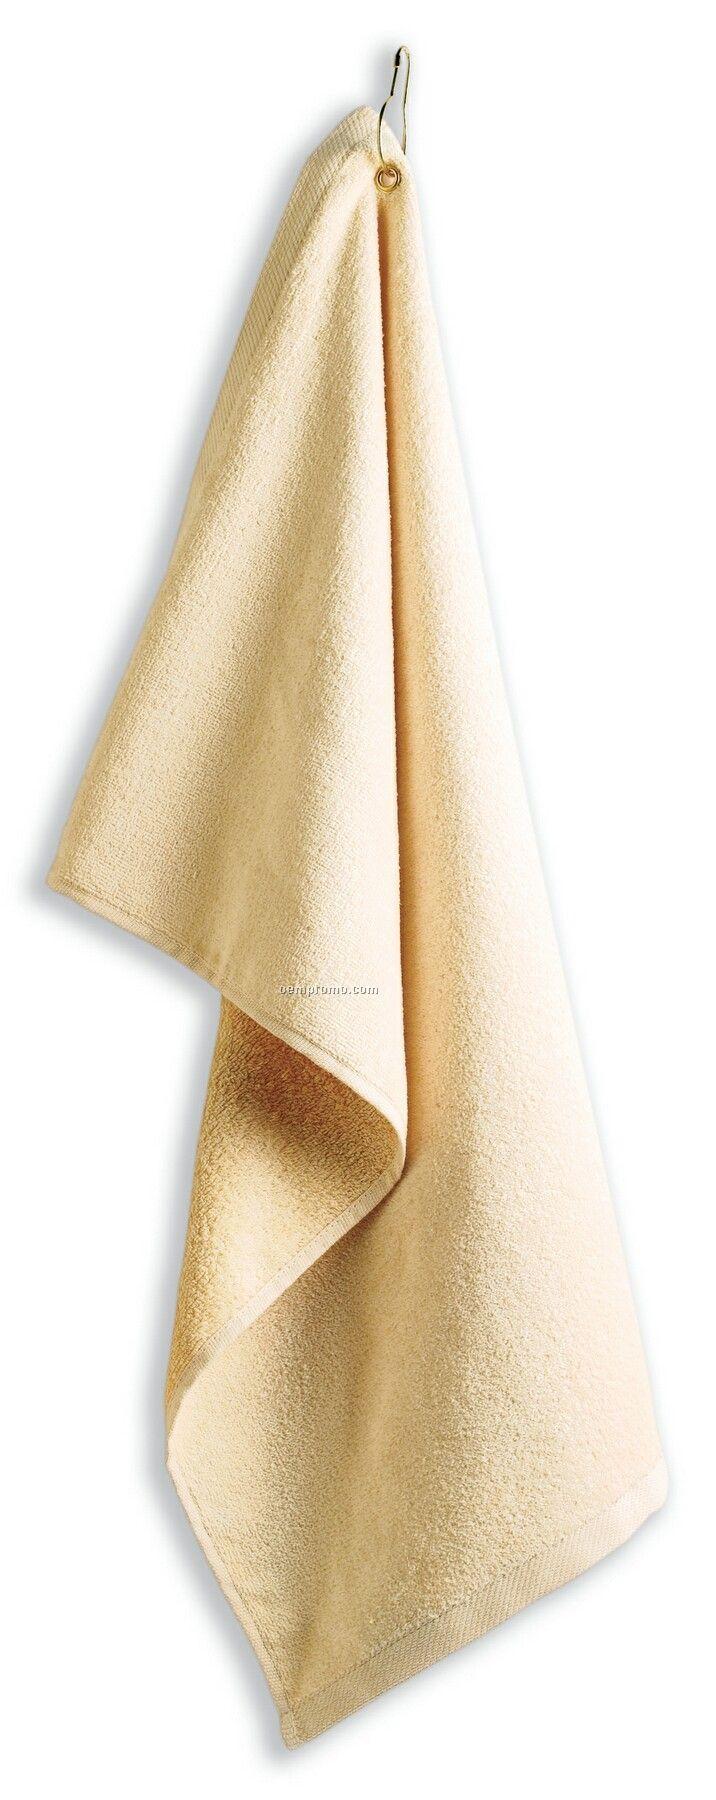 towels china wholesale towels page 45. Black Bedroom Furniture Sets. Home Design Ideas